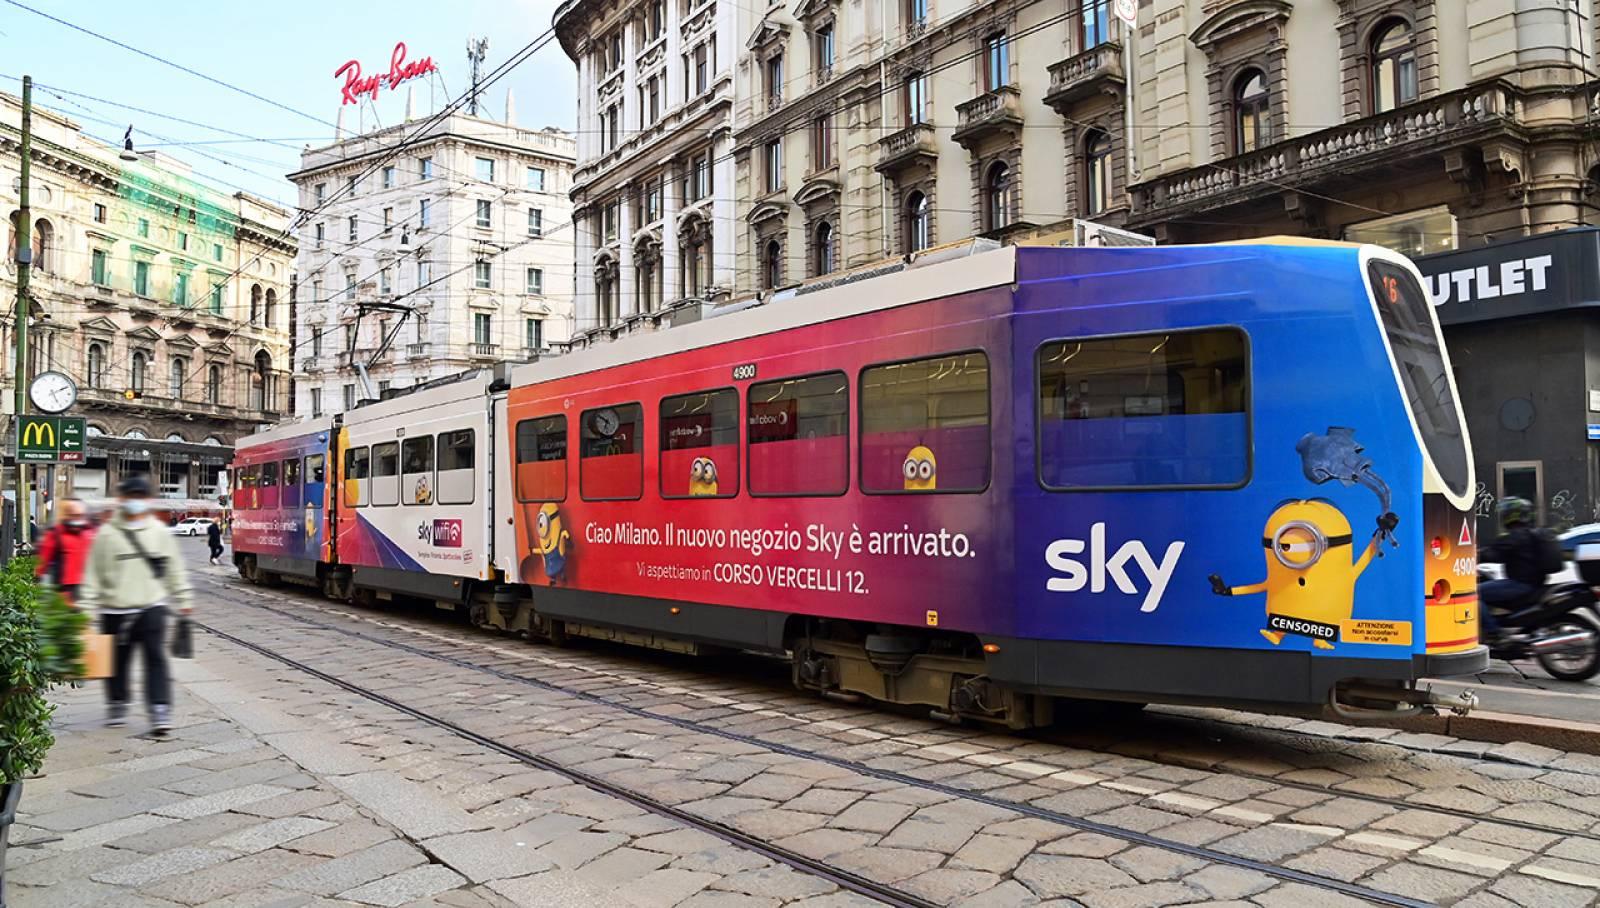 Pubblicità su tram a Milano IGPDecaux Full-Wrap per SKY Italia